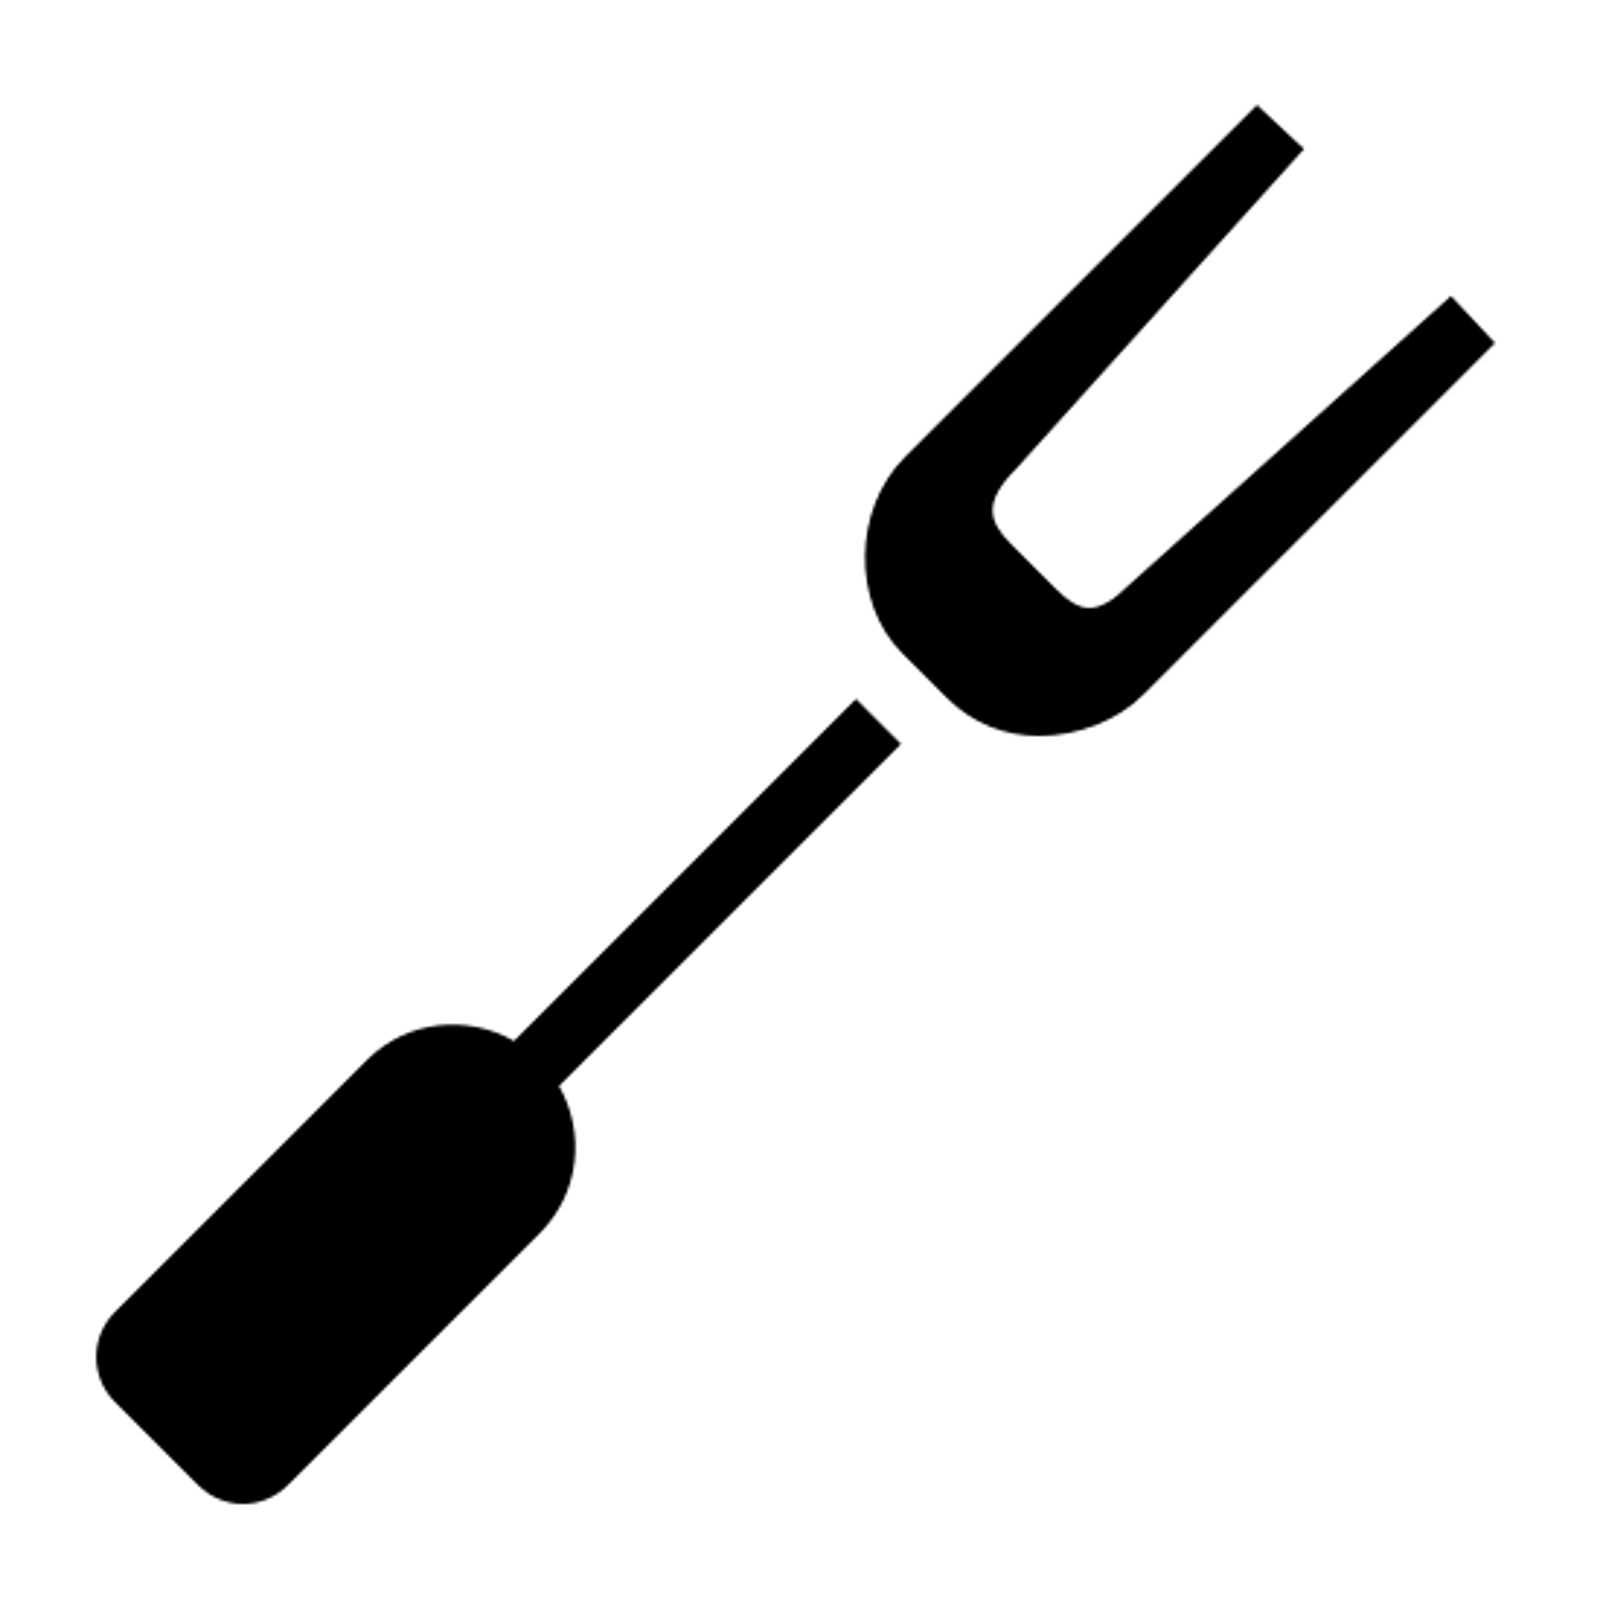 Big Fork Filled icon